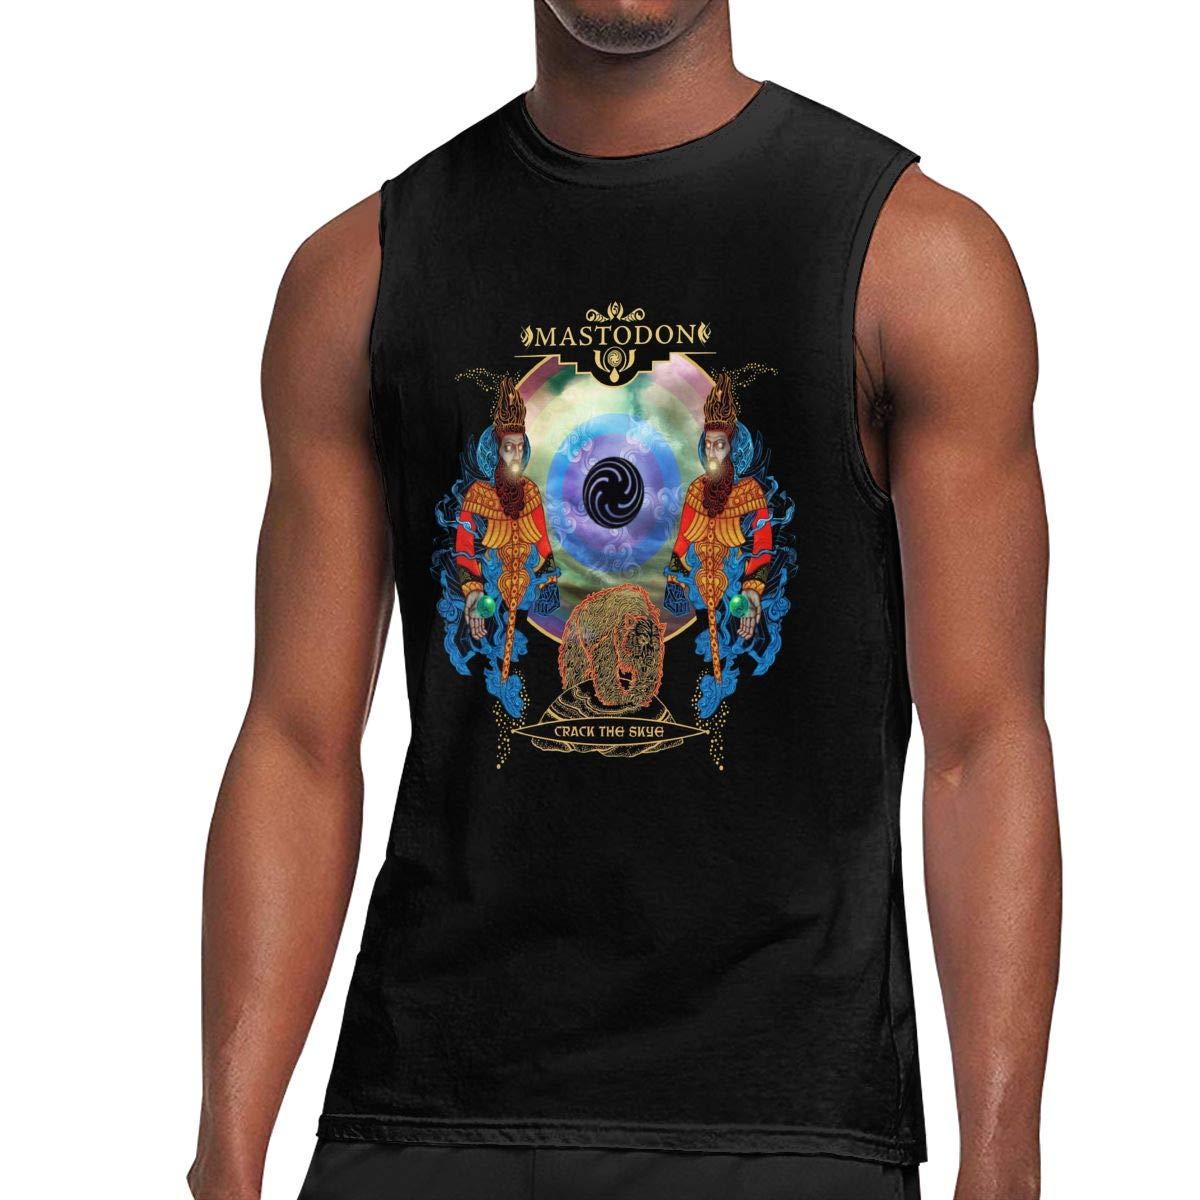 Mastodon Crack The Sky T Shirt Man Ultra Tee Sleeveless T Shirt Fashion Top Tank Top Tee 7